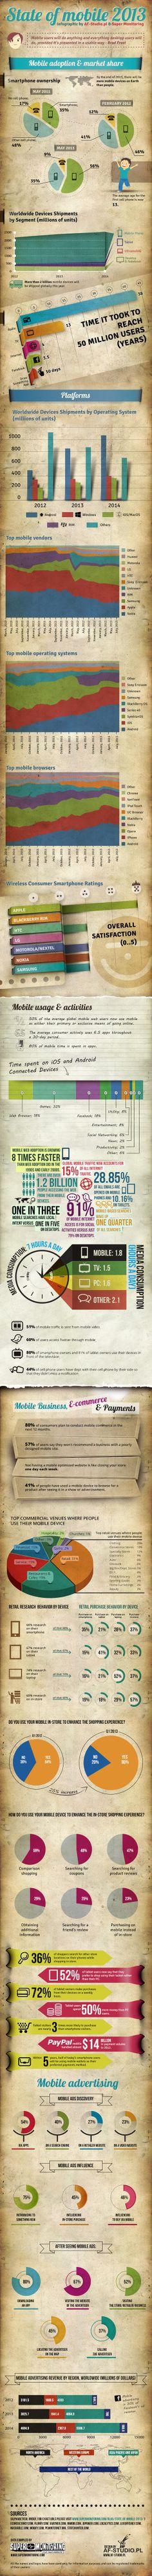 2013 Mobile Growth Statistics http://i2.wp.com/www.futurebiz.de/wp-content/uploads/2013/10/Infographic-2013-Mobile-Growth-Statistics-Medium.jpg?resize=536%2C9085